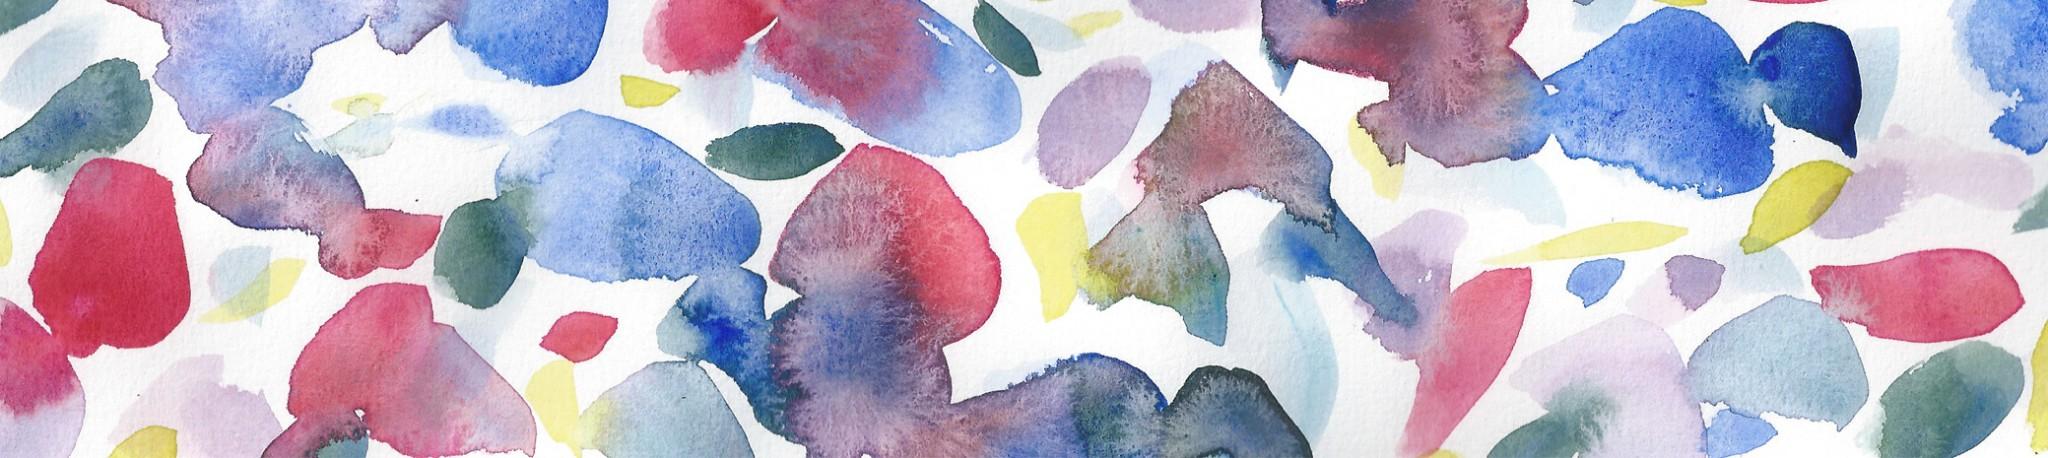 rosie-watercolour-back-drop-1